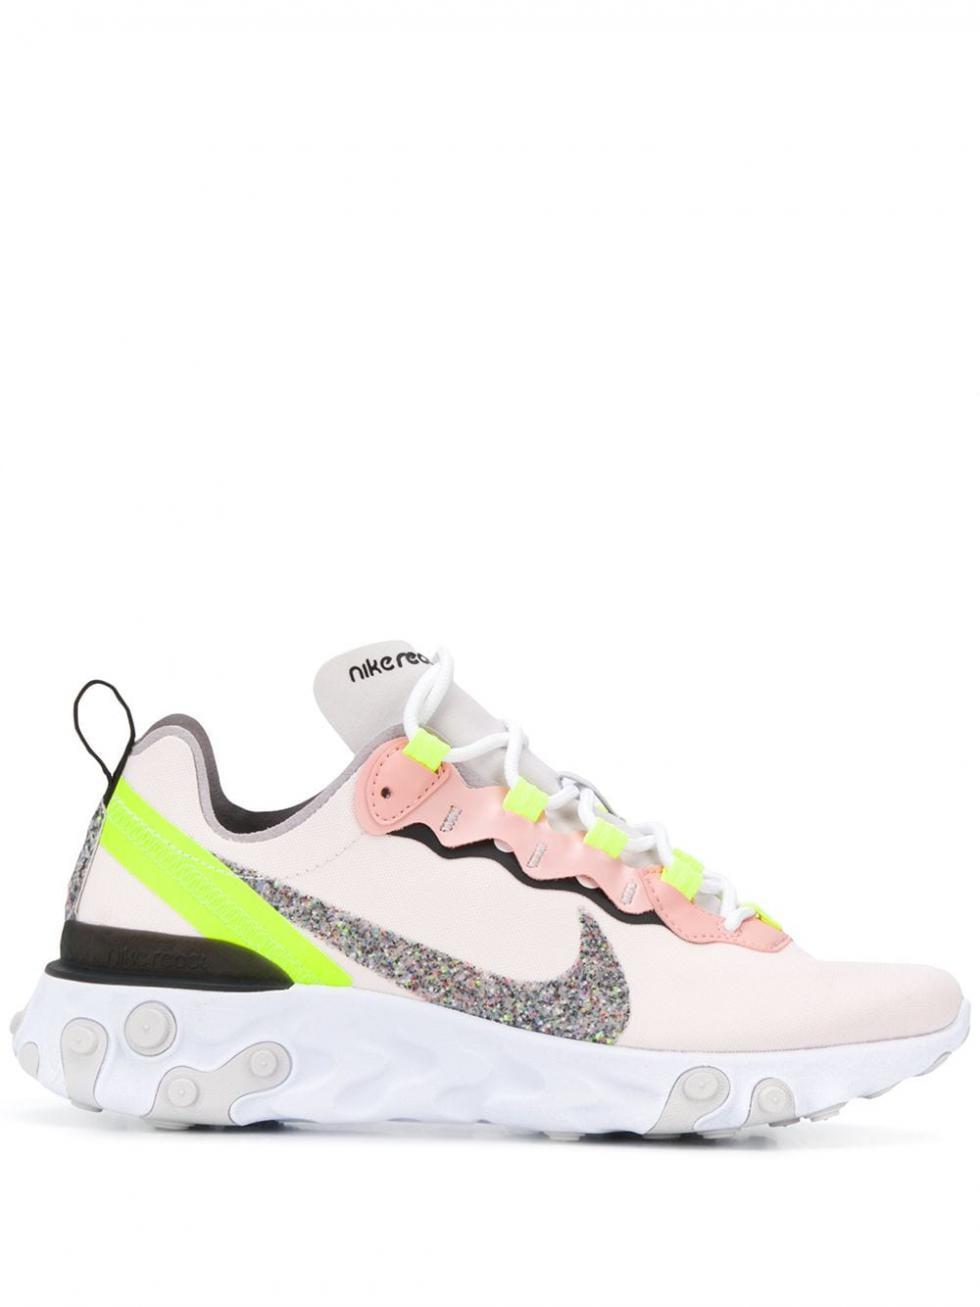 Femme Baskets React Element 55 Premium Light Soft Pink   Baskets Nike - Angelic Claws